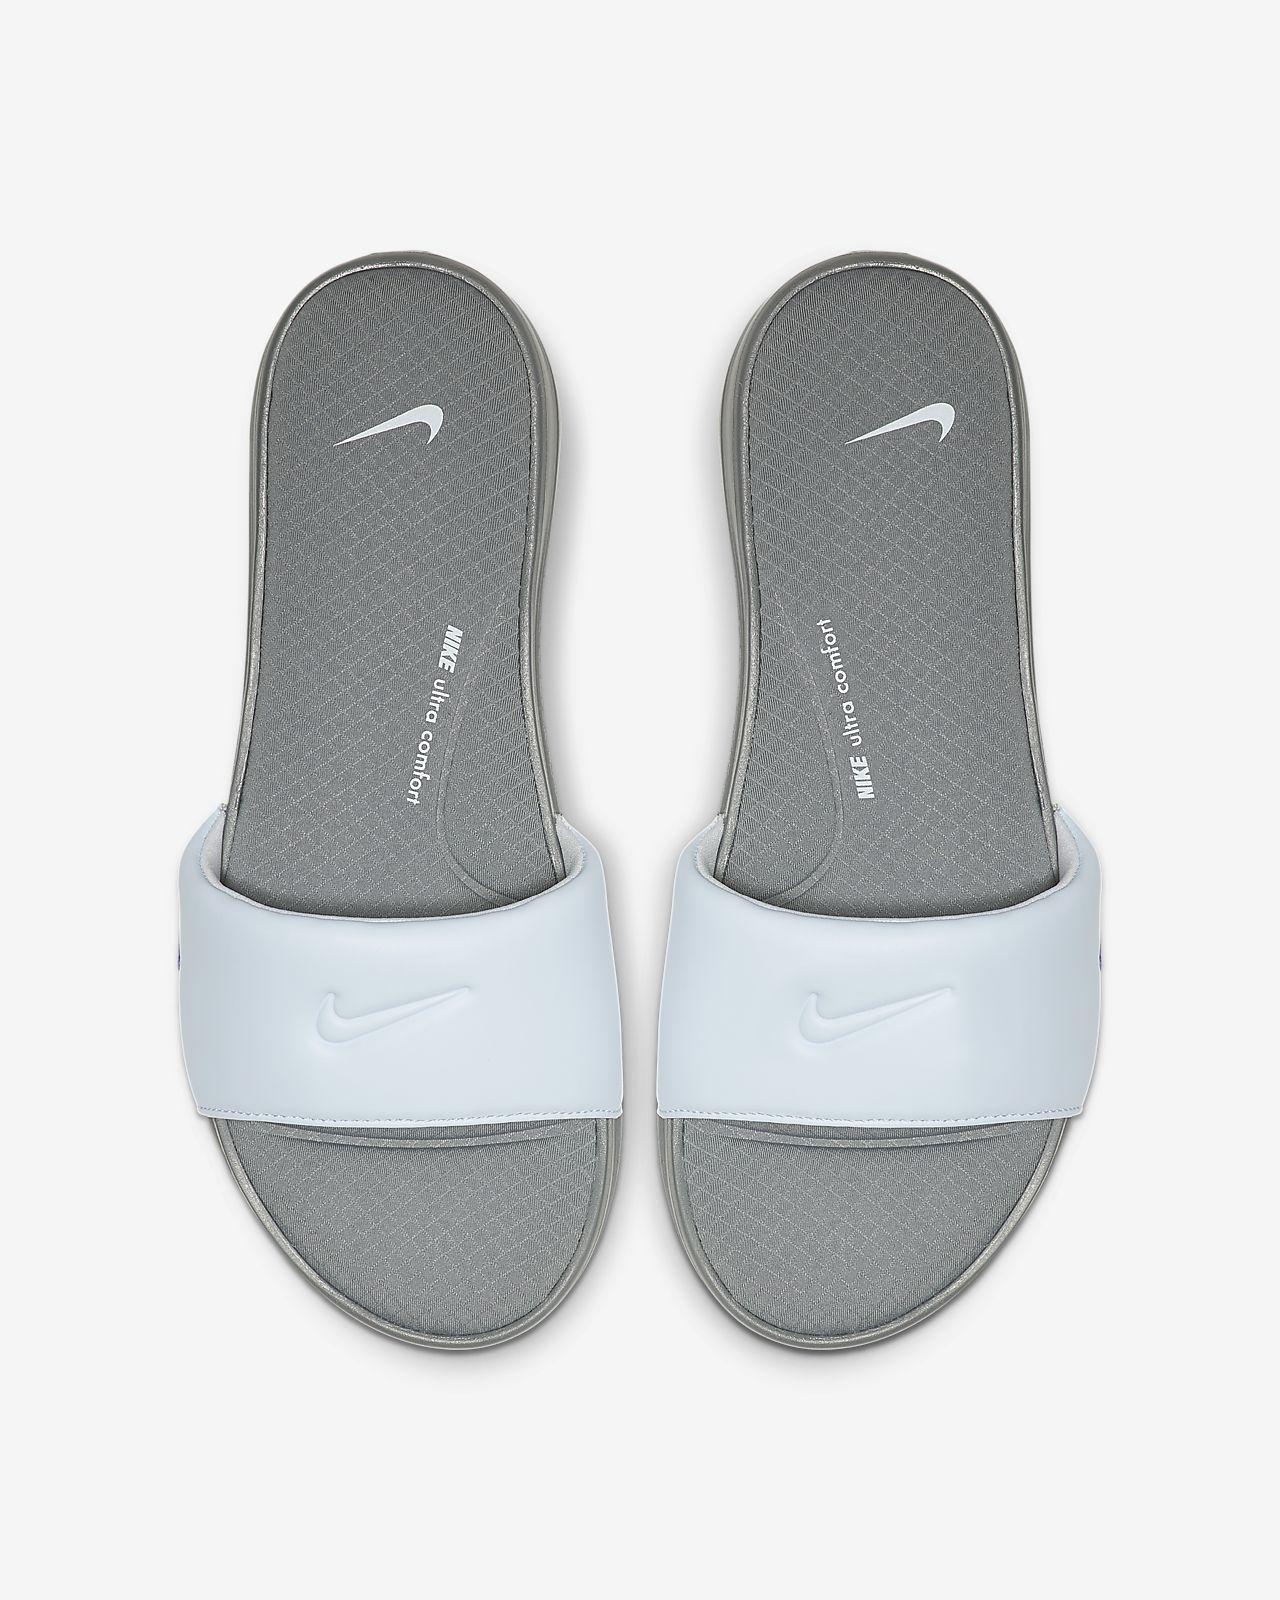 Nike Ultra Comfort3 Slide 女子拖鞋